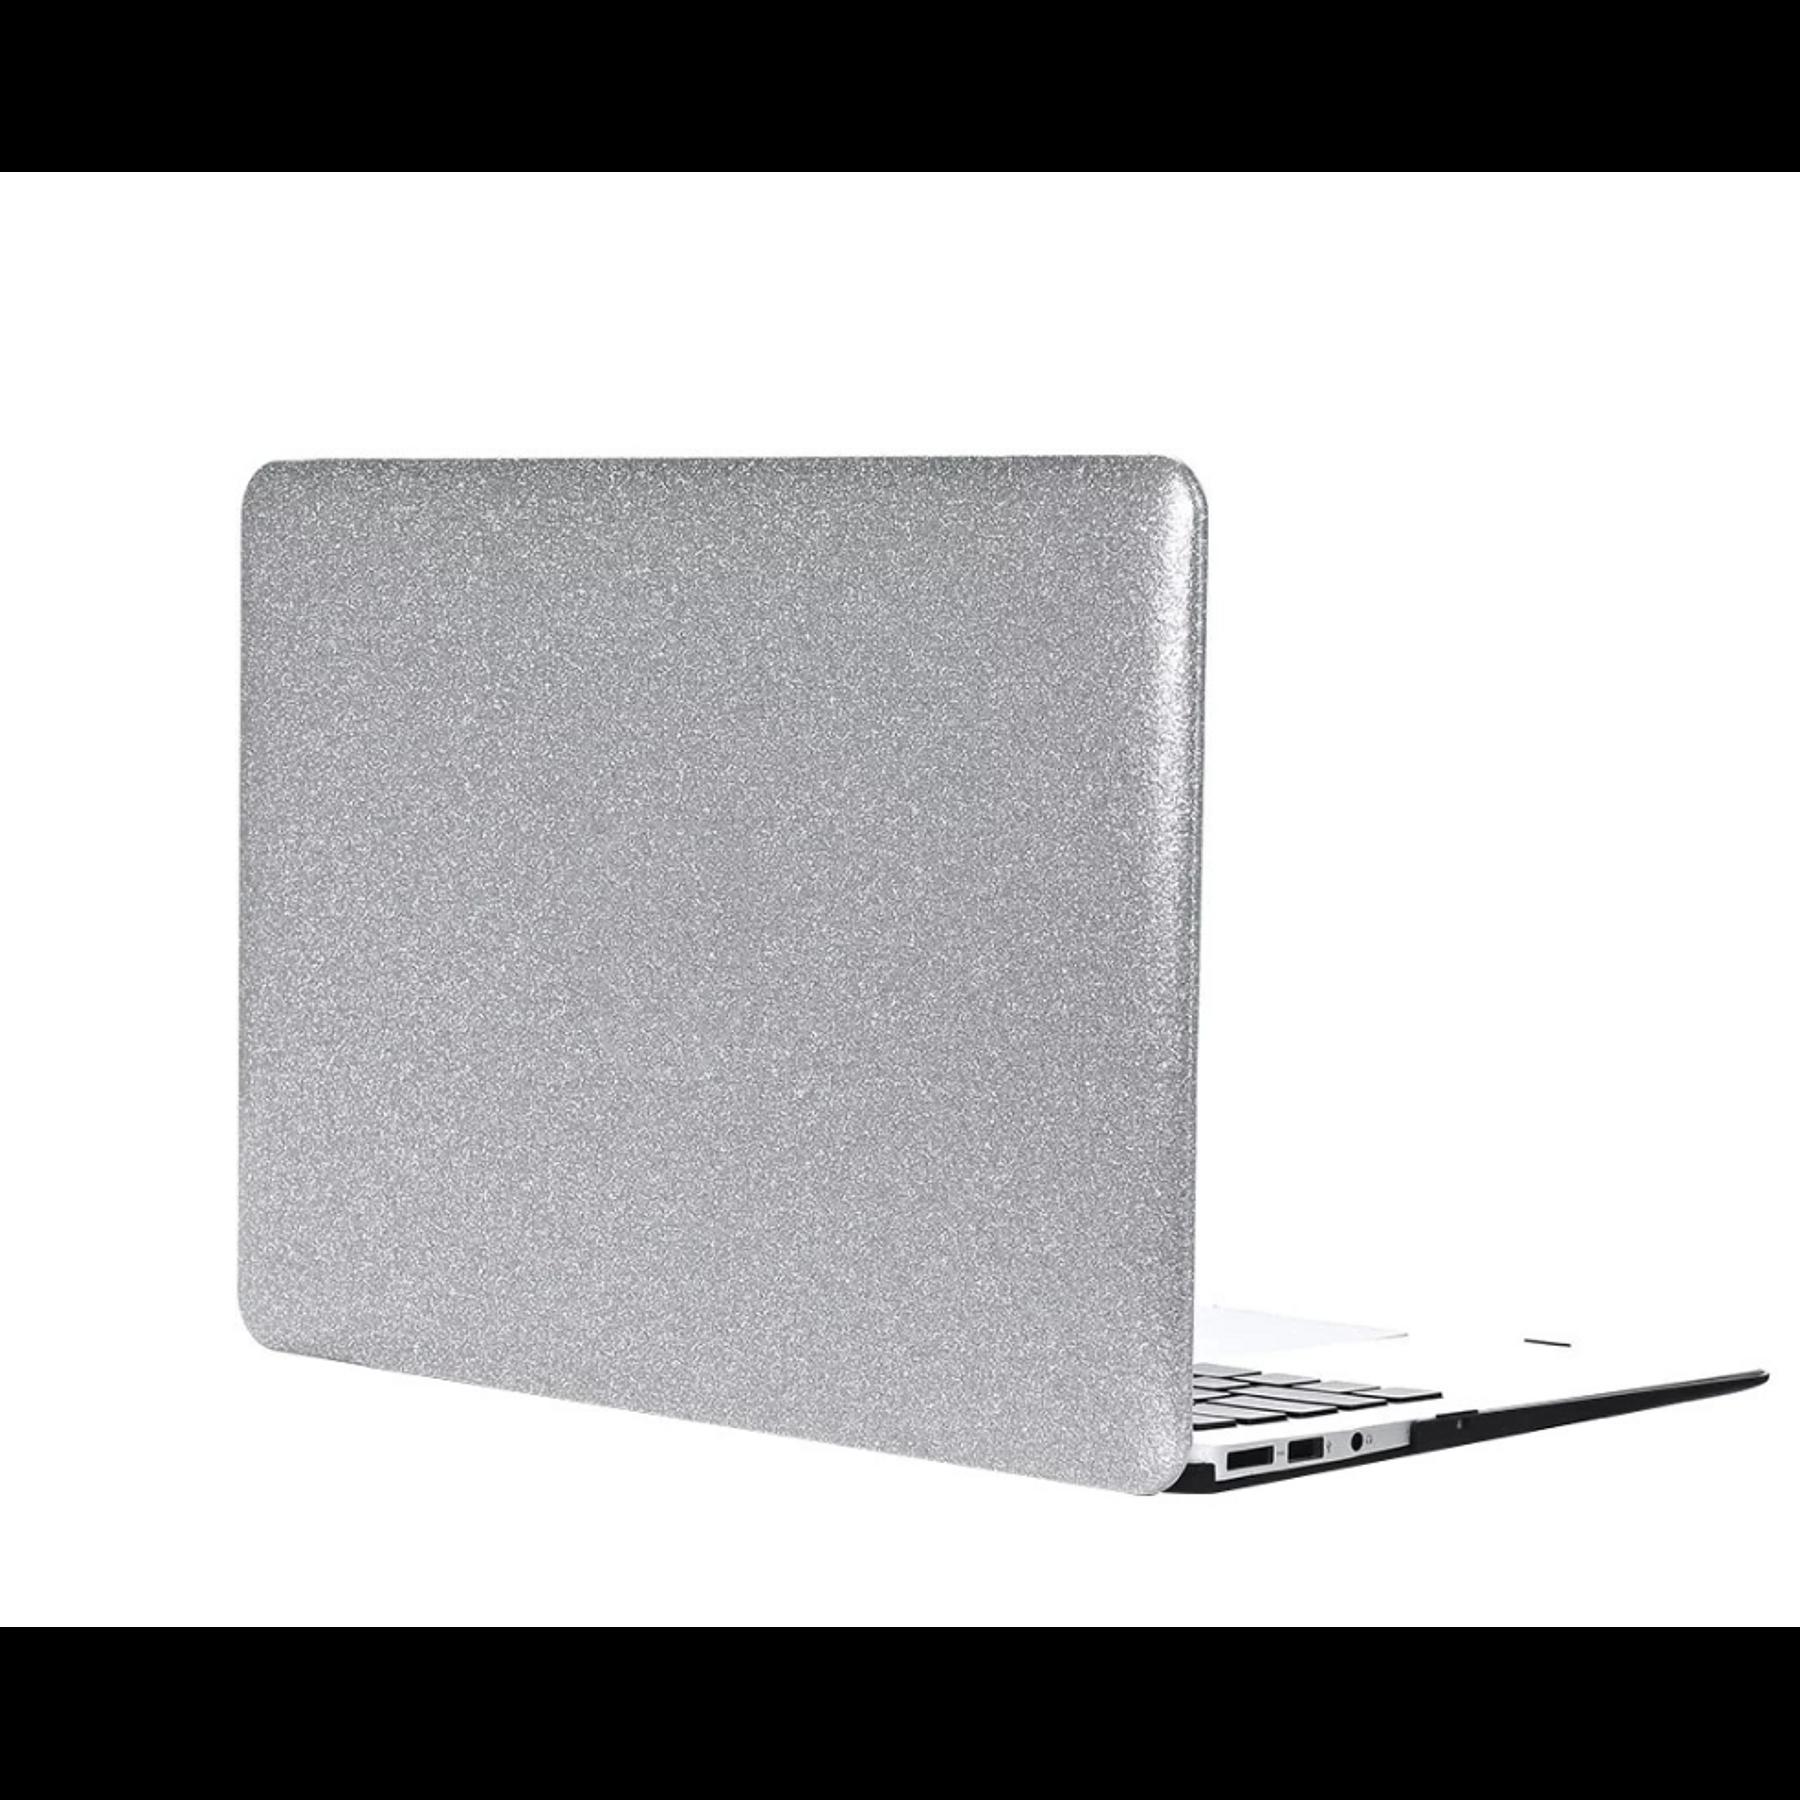 Carcasa New MacBook Air 13